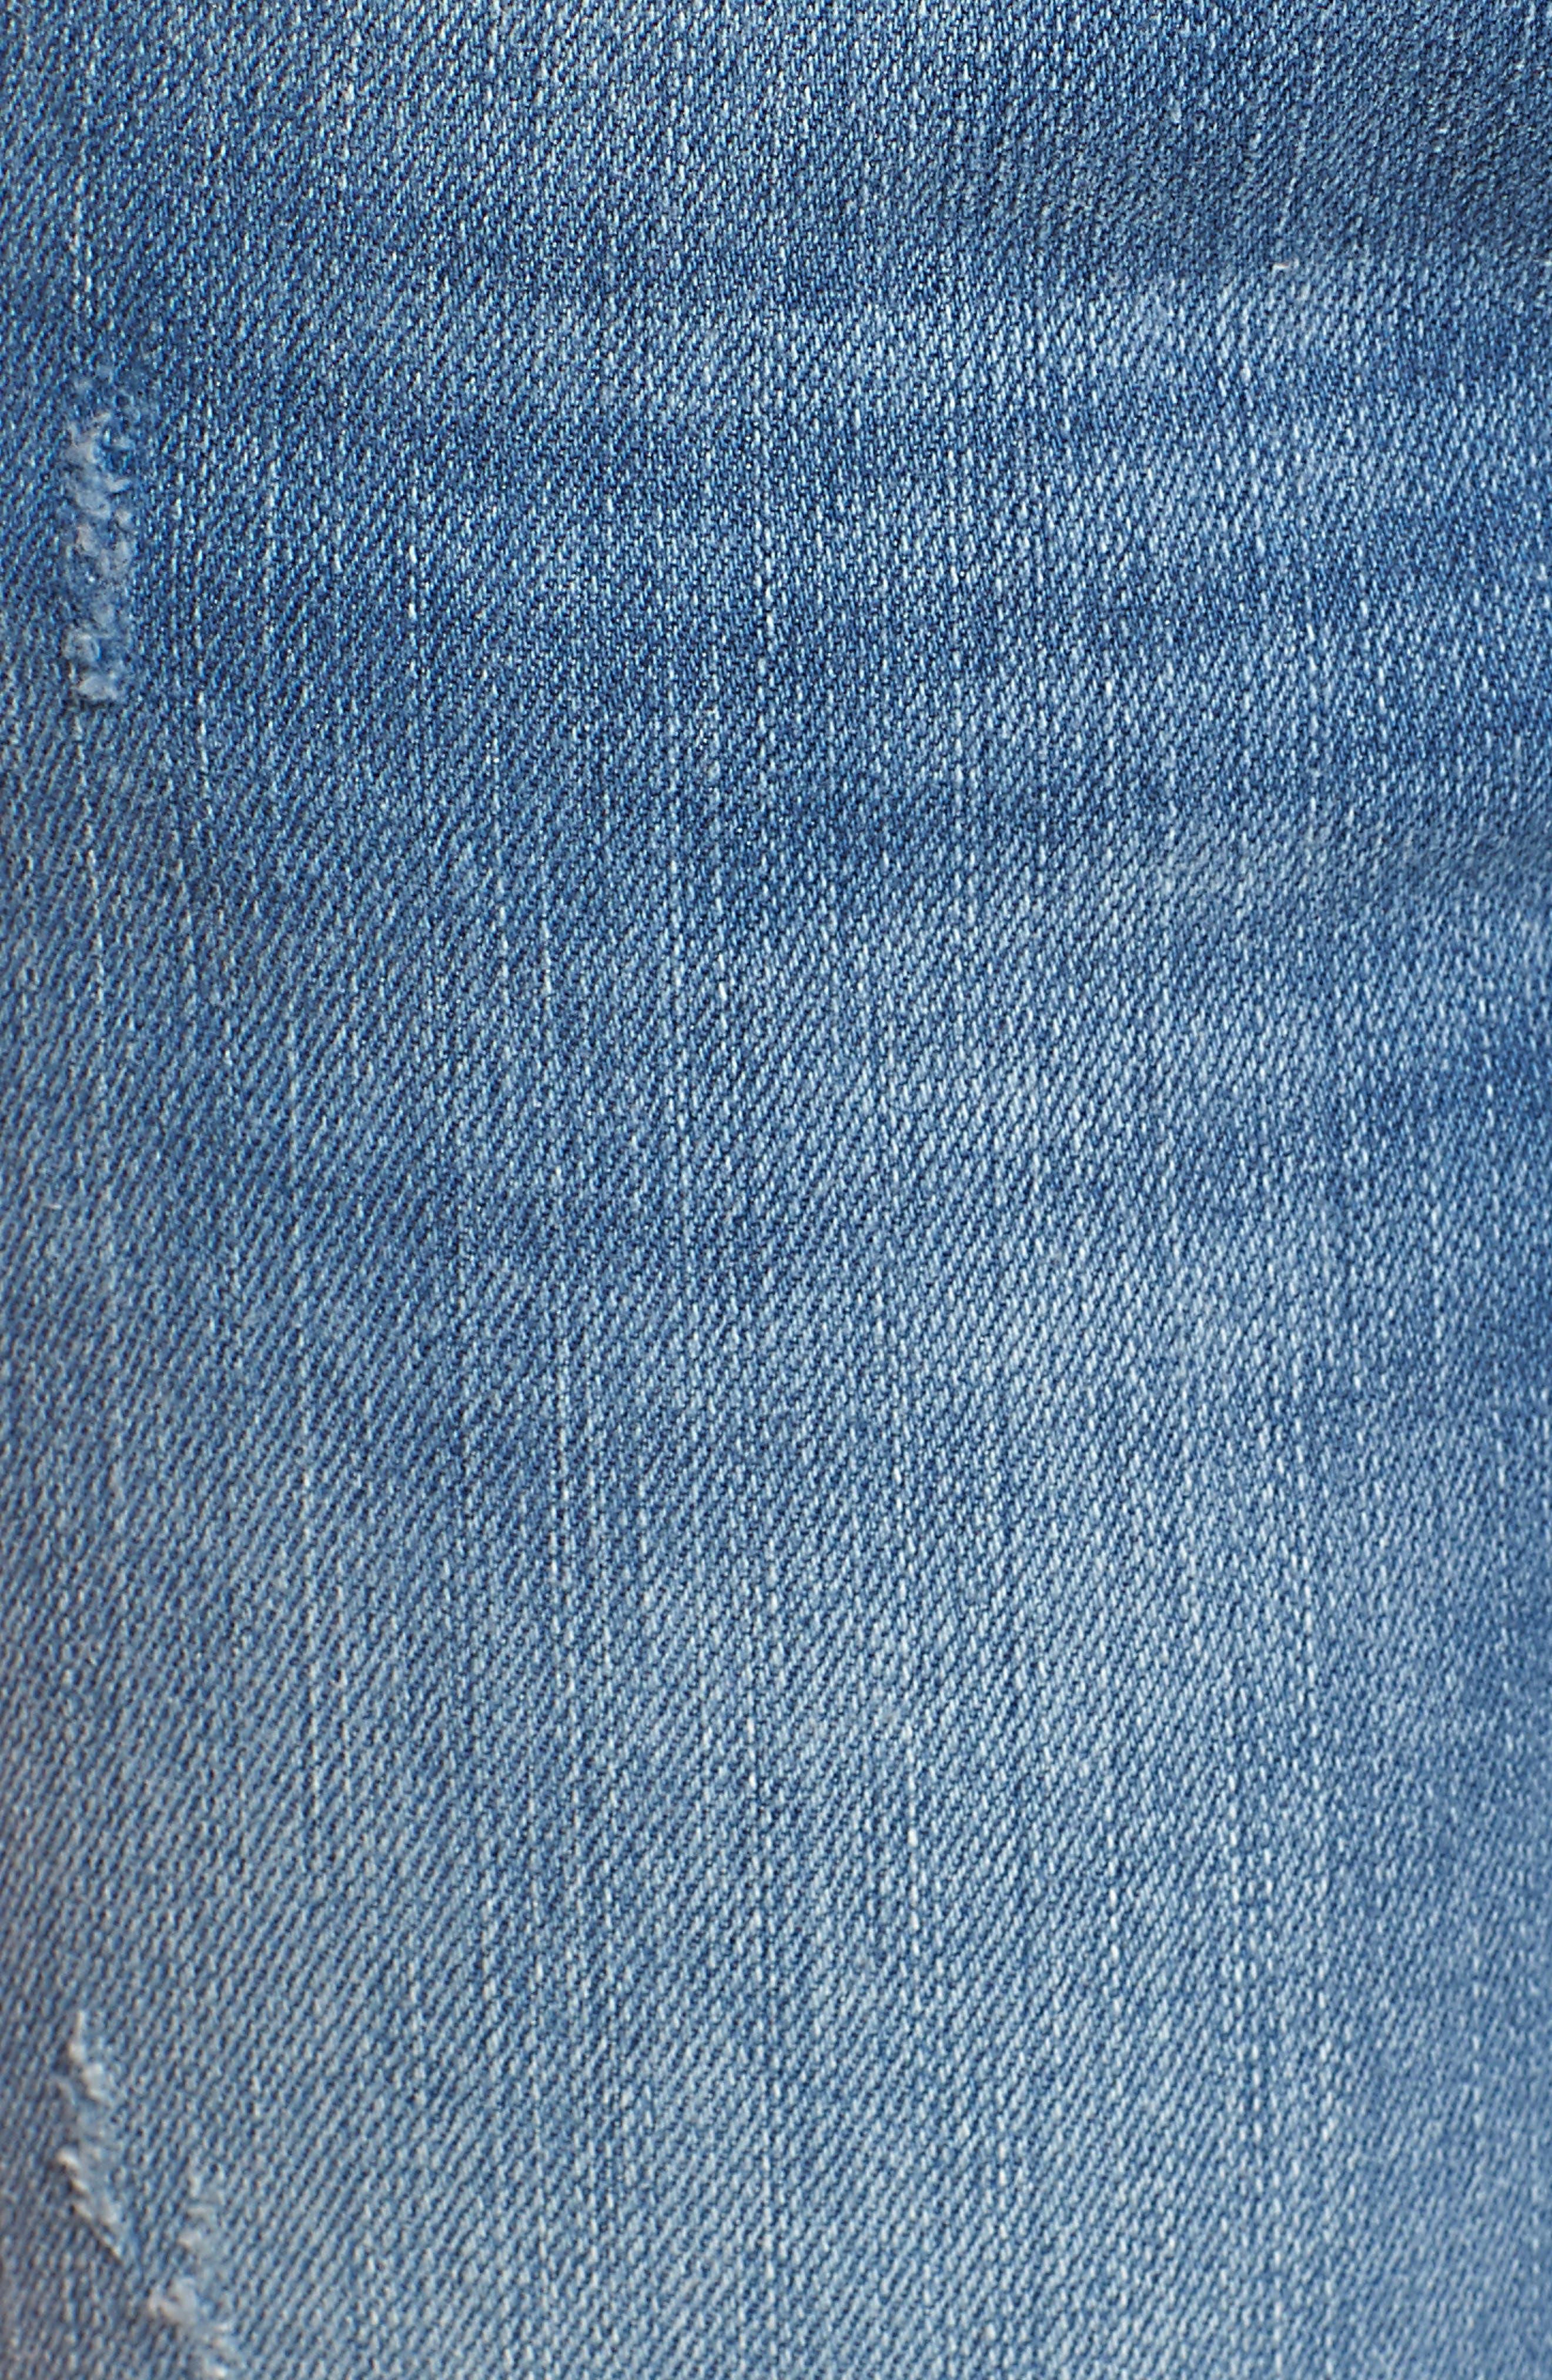 Kerry Fringe Hem Ankle Jeans,                             Alternate thumbnail 6, color,                             Distressed Vintage